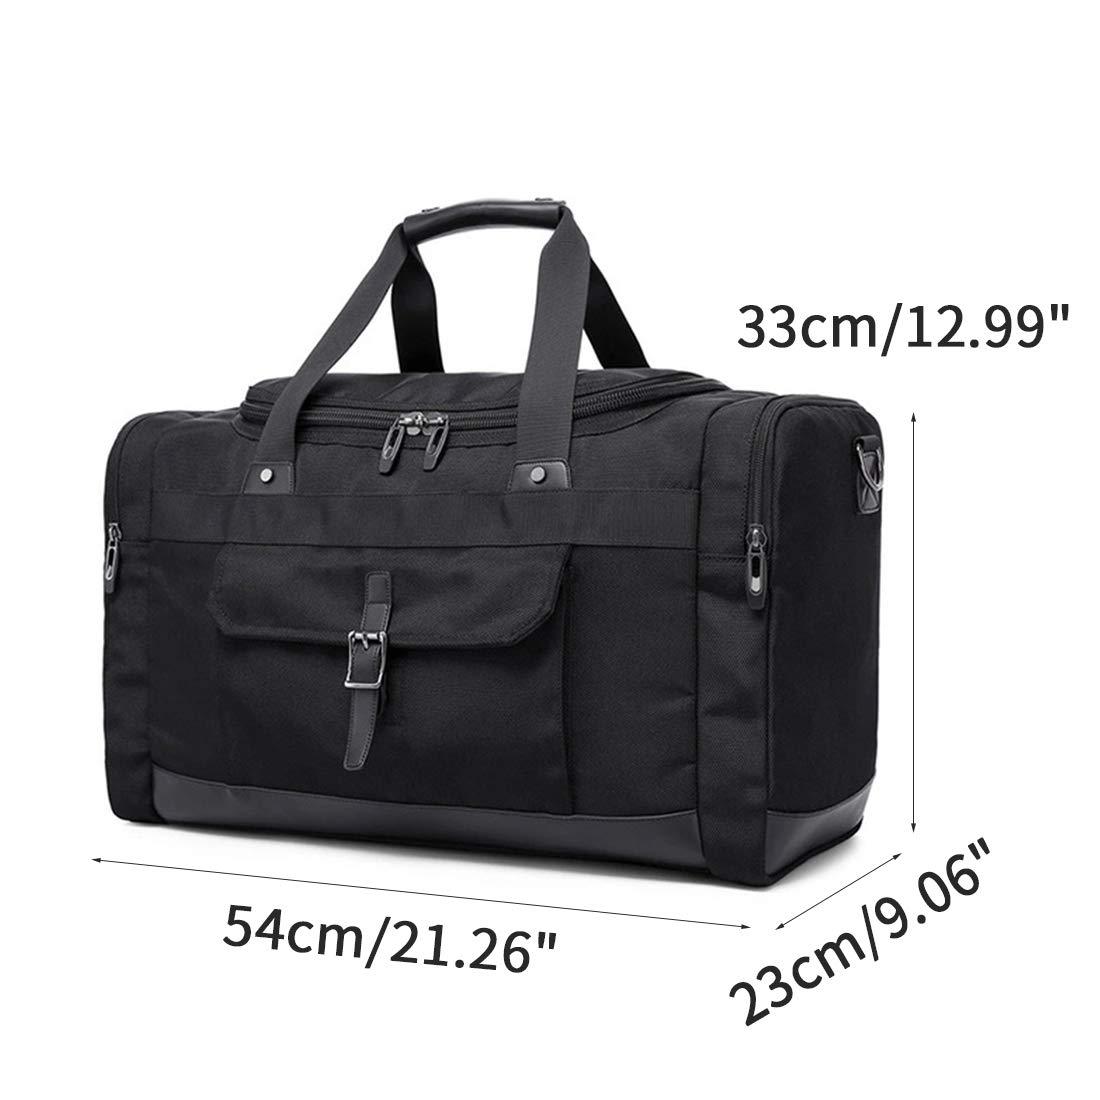 Enerhu Travel Duffel Bag Waterproof Foldable Luggage Bags Tear Resistant for Sports Extra Large Black